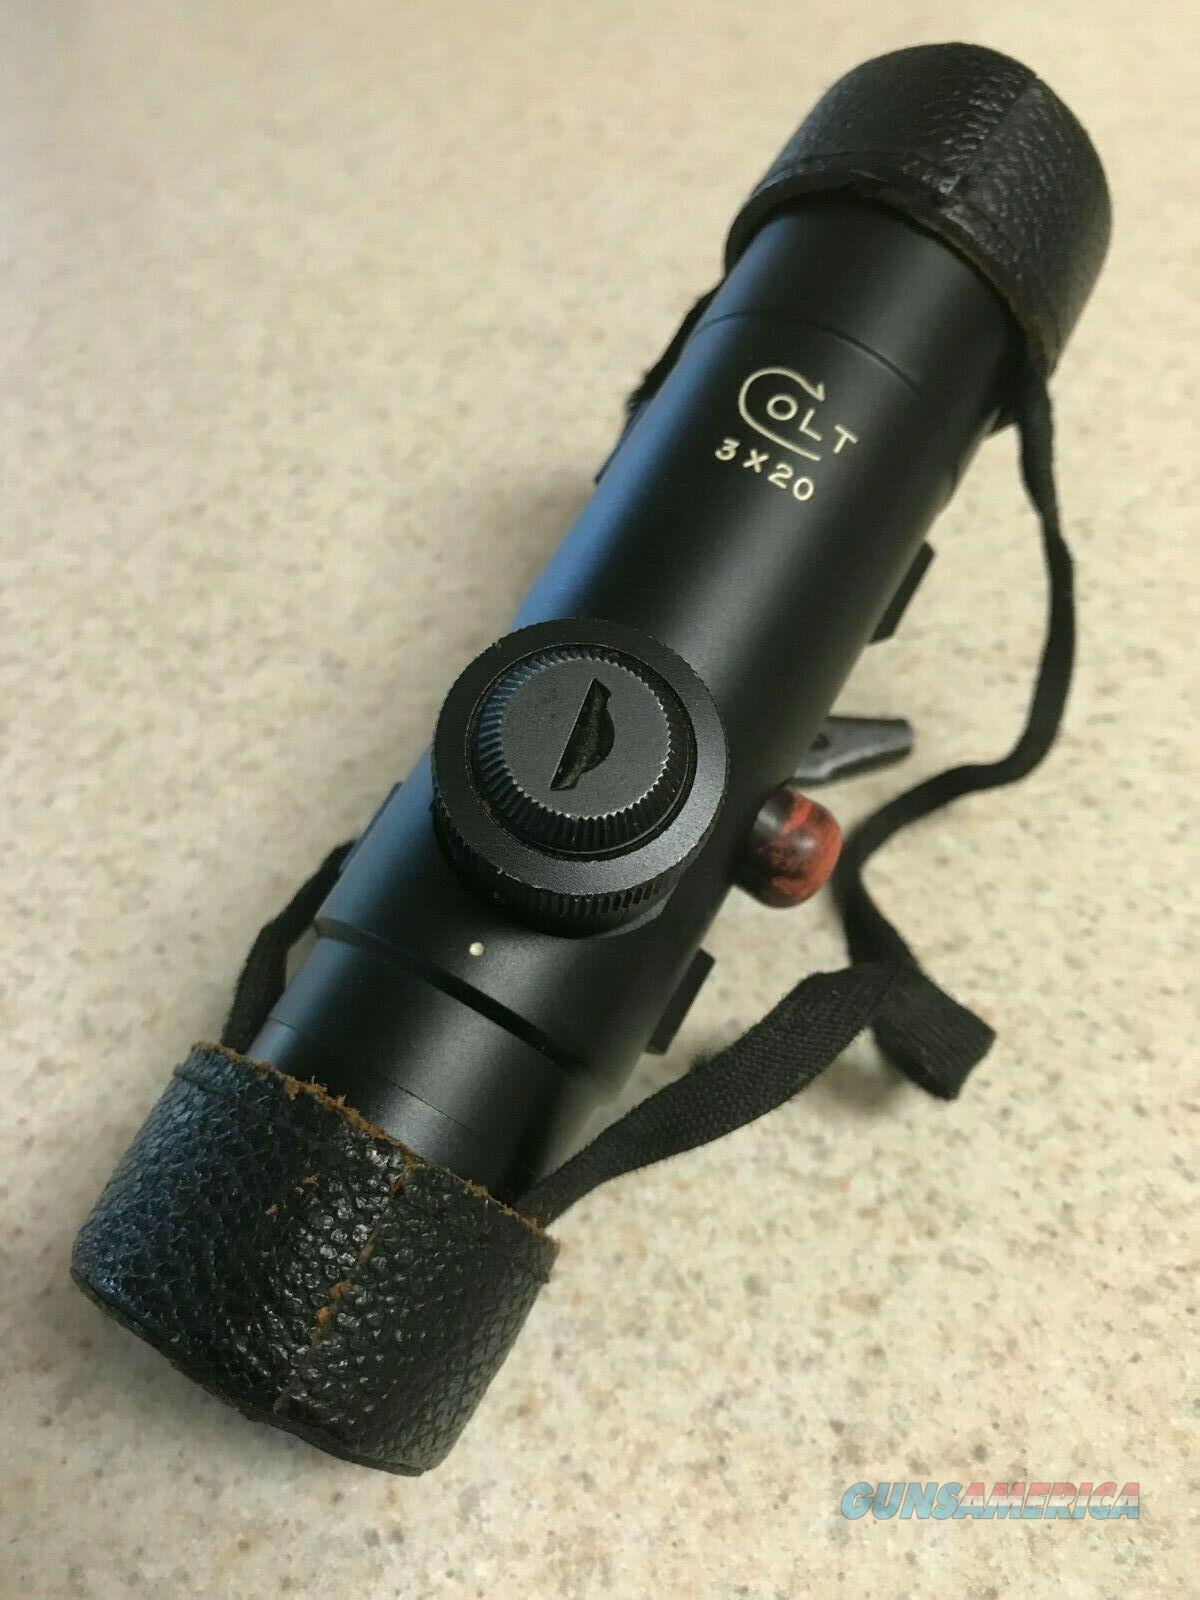 Colt AR-15 3 X 20 Scope with Lens Cap  Non-Guns > Scopes/Mounts/Rings & Optics > Rifle Scopes > Fixed Focal Length